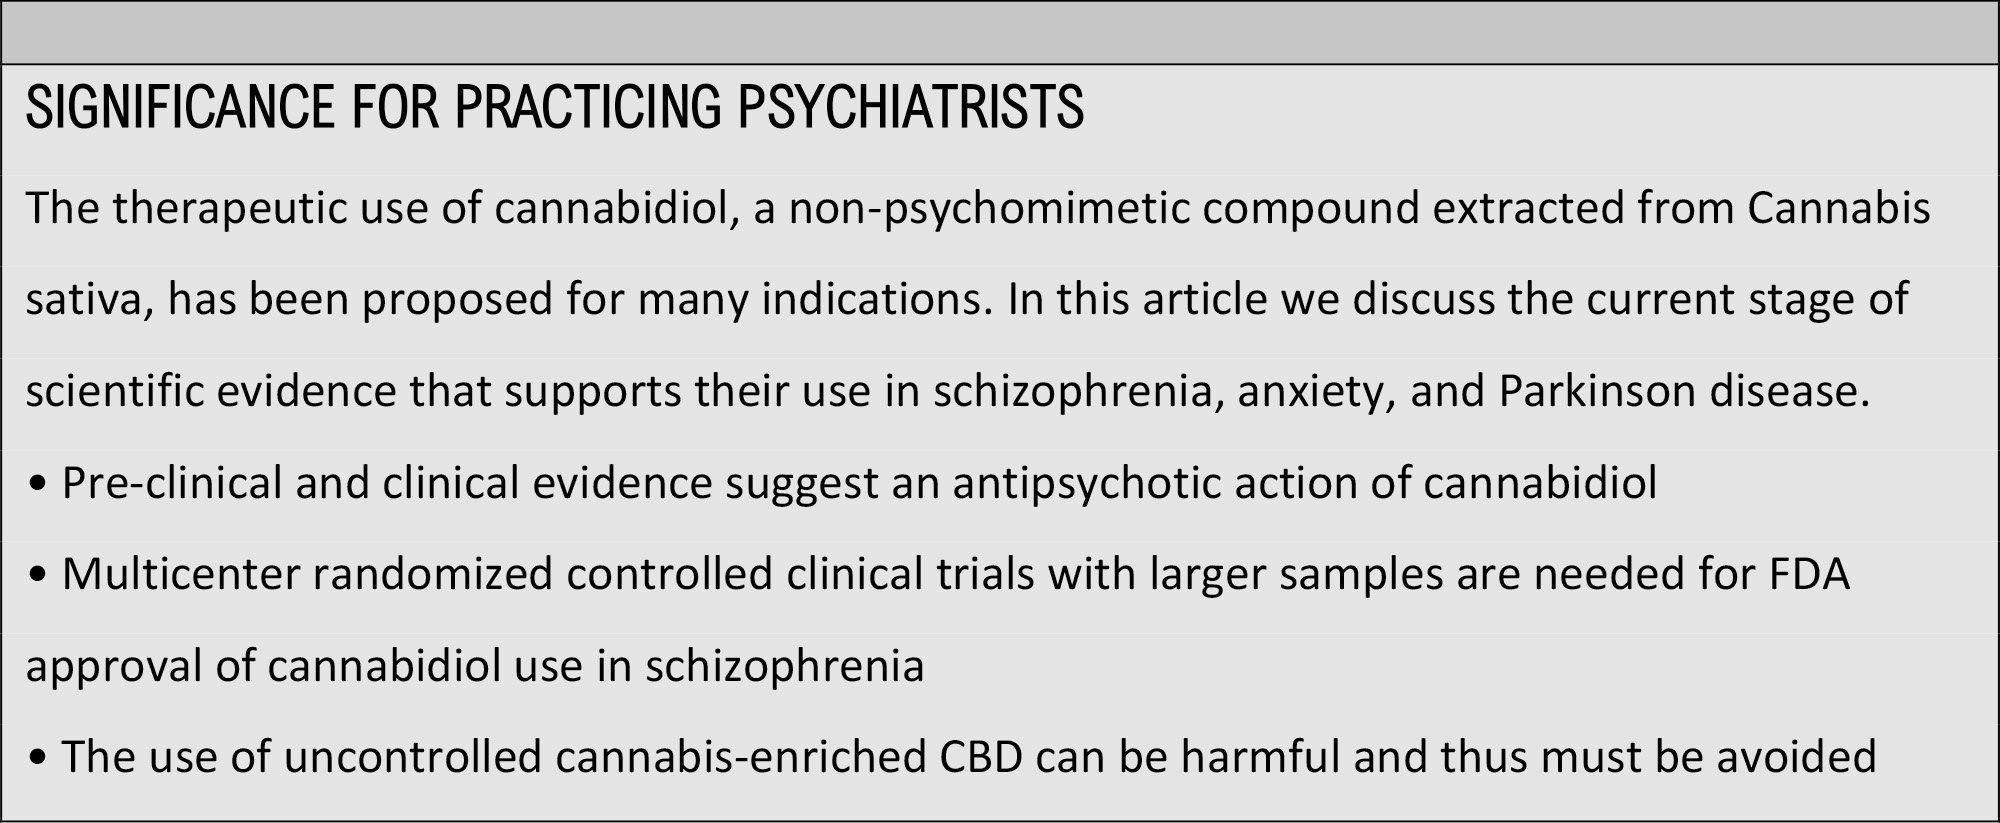 CBD OIL FOR PSYCHOSIS & SCHIZOPHRENIA ...